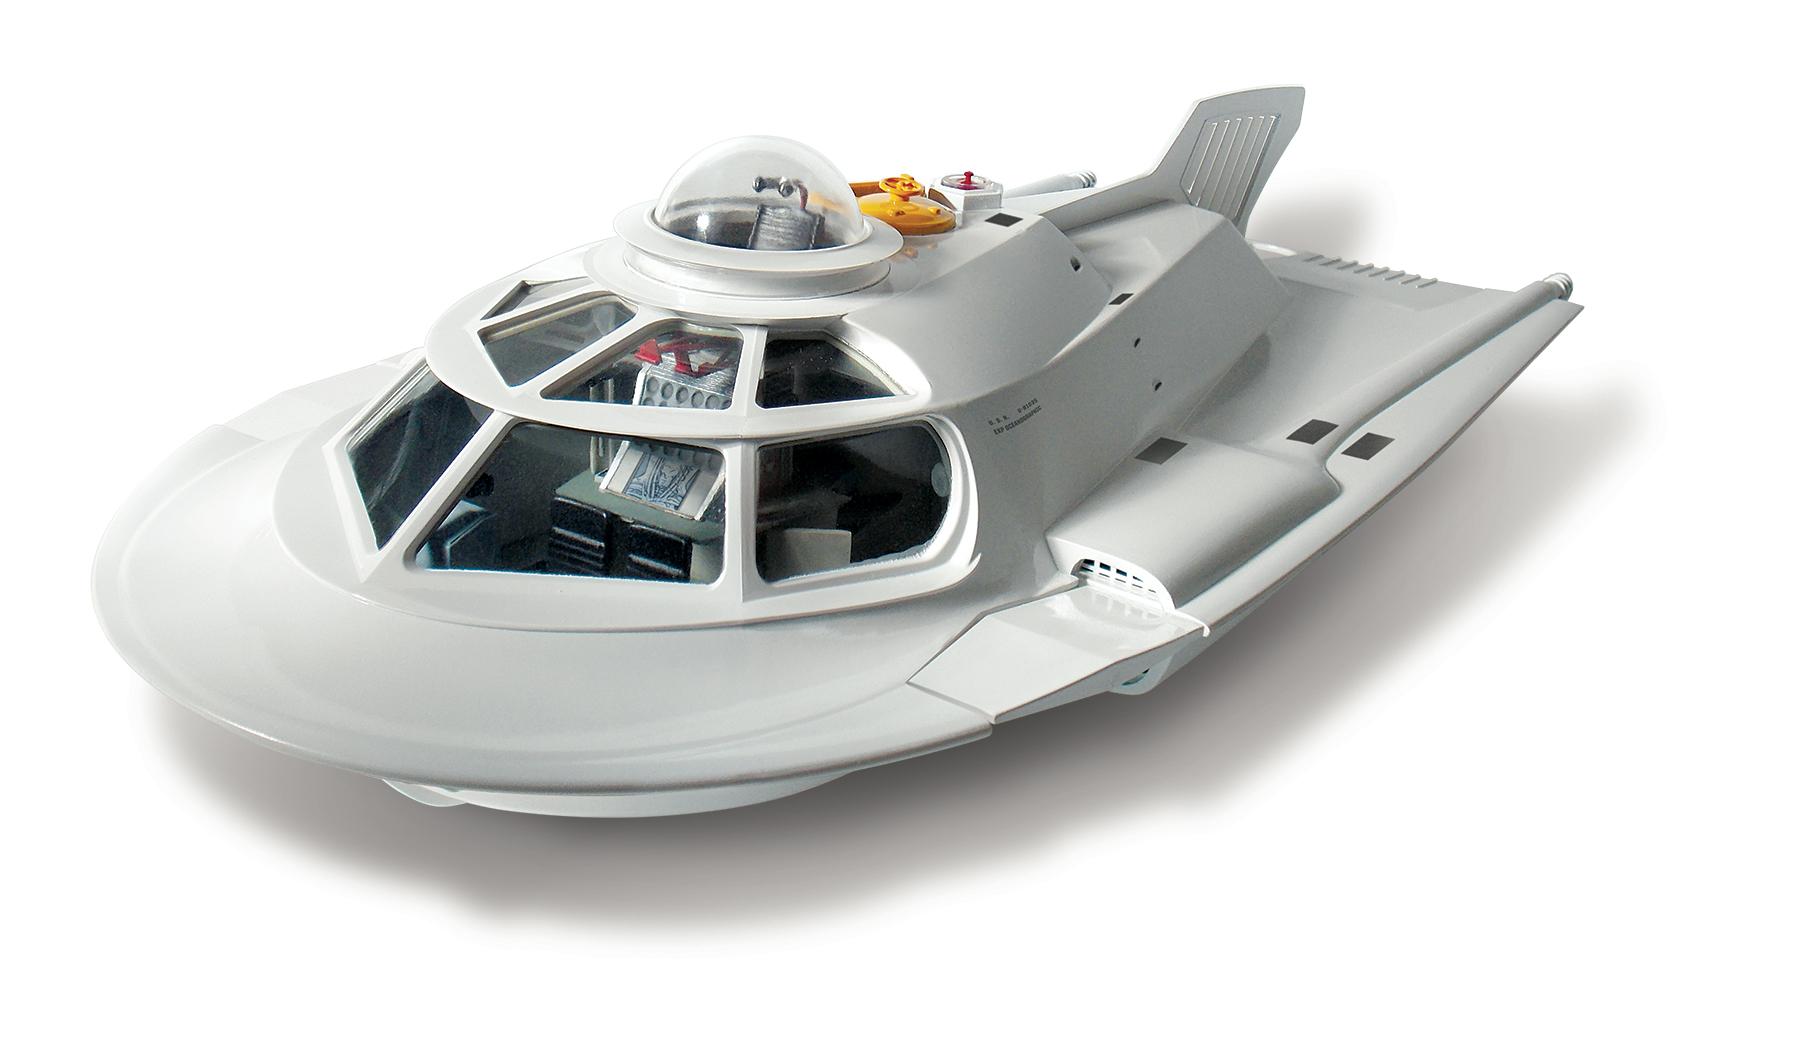 fantastic-voyage-proteus-kit-moebius.jpg